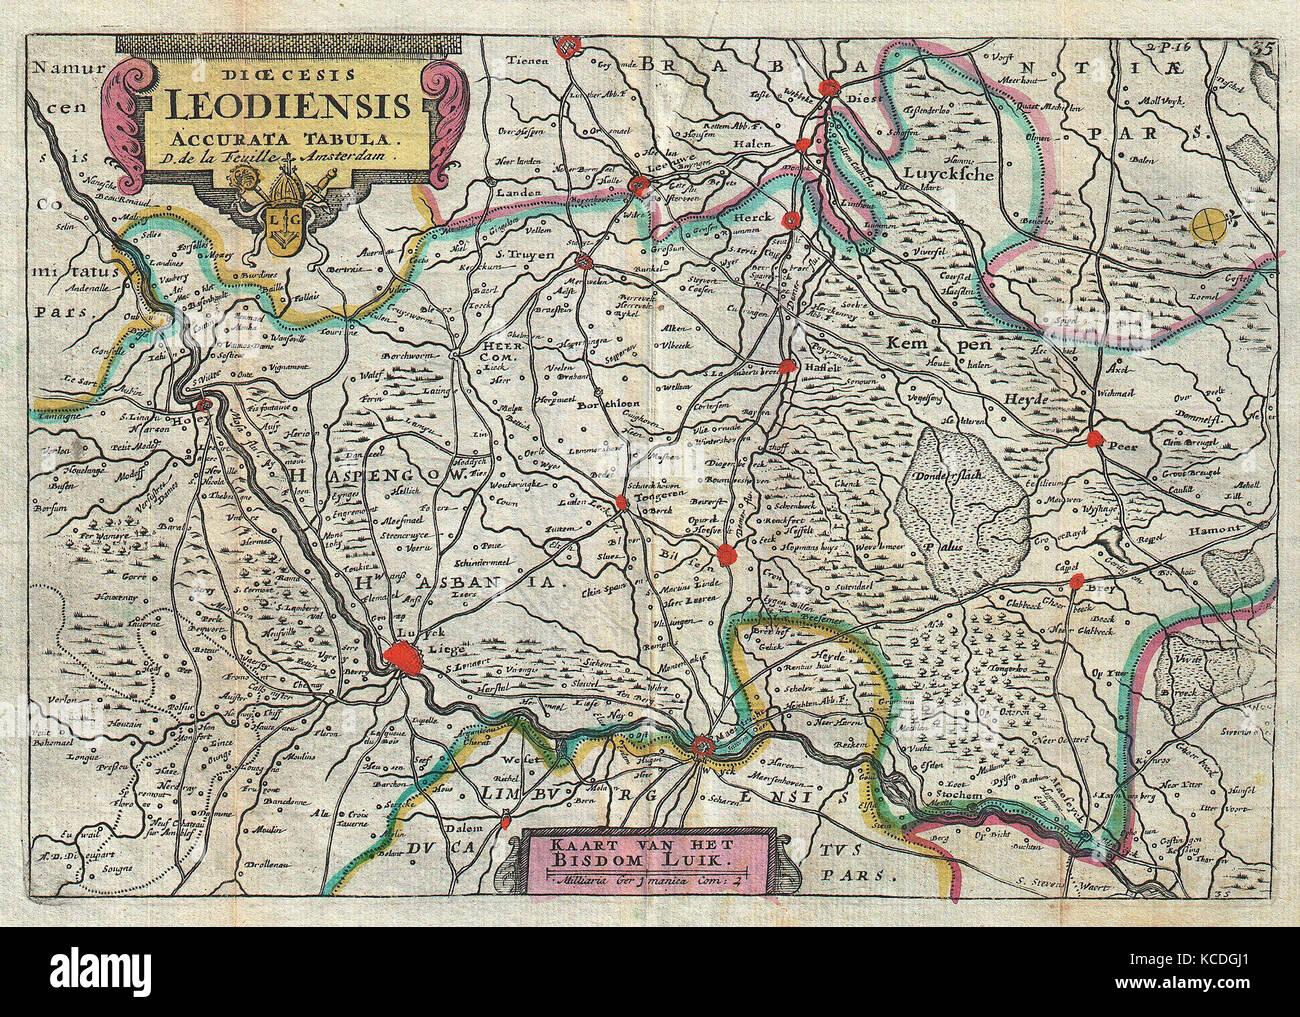 1747 la feuille map of liege belgium leodiensis